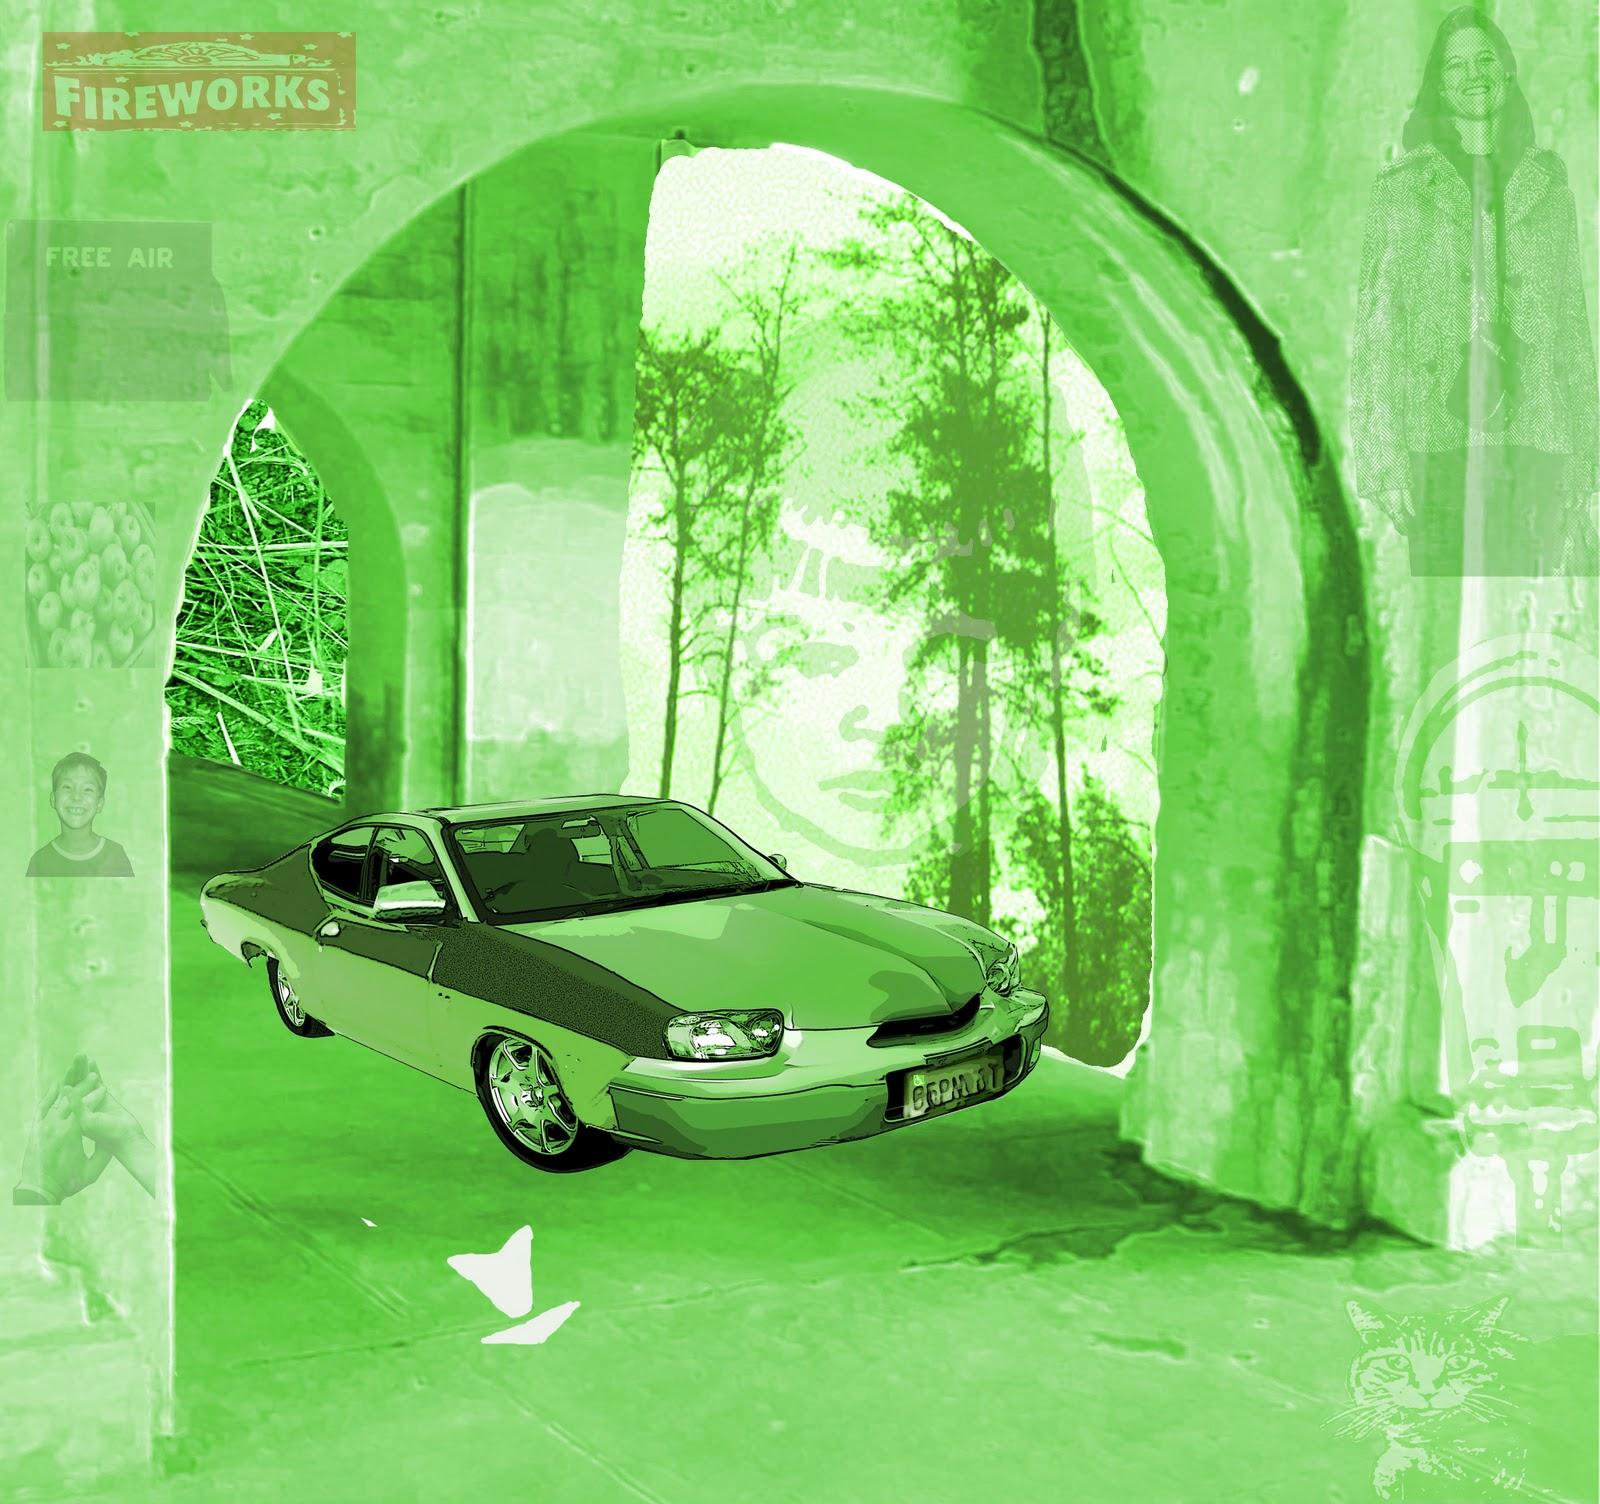 Wahsdigitalimagingkennedym 15 Green Things